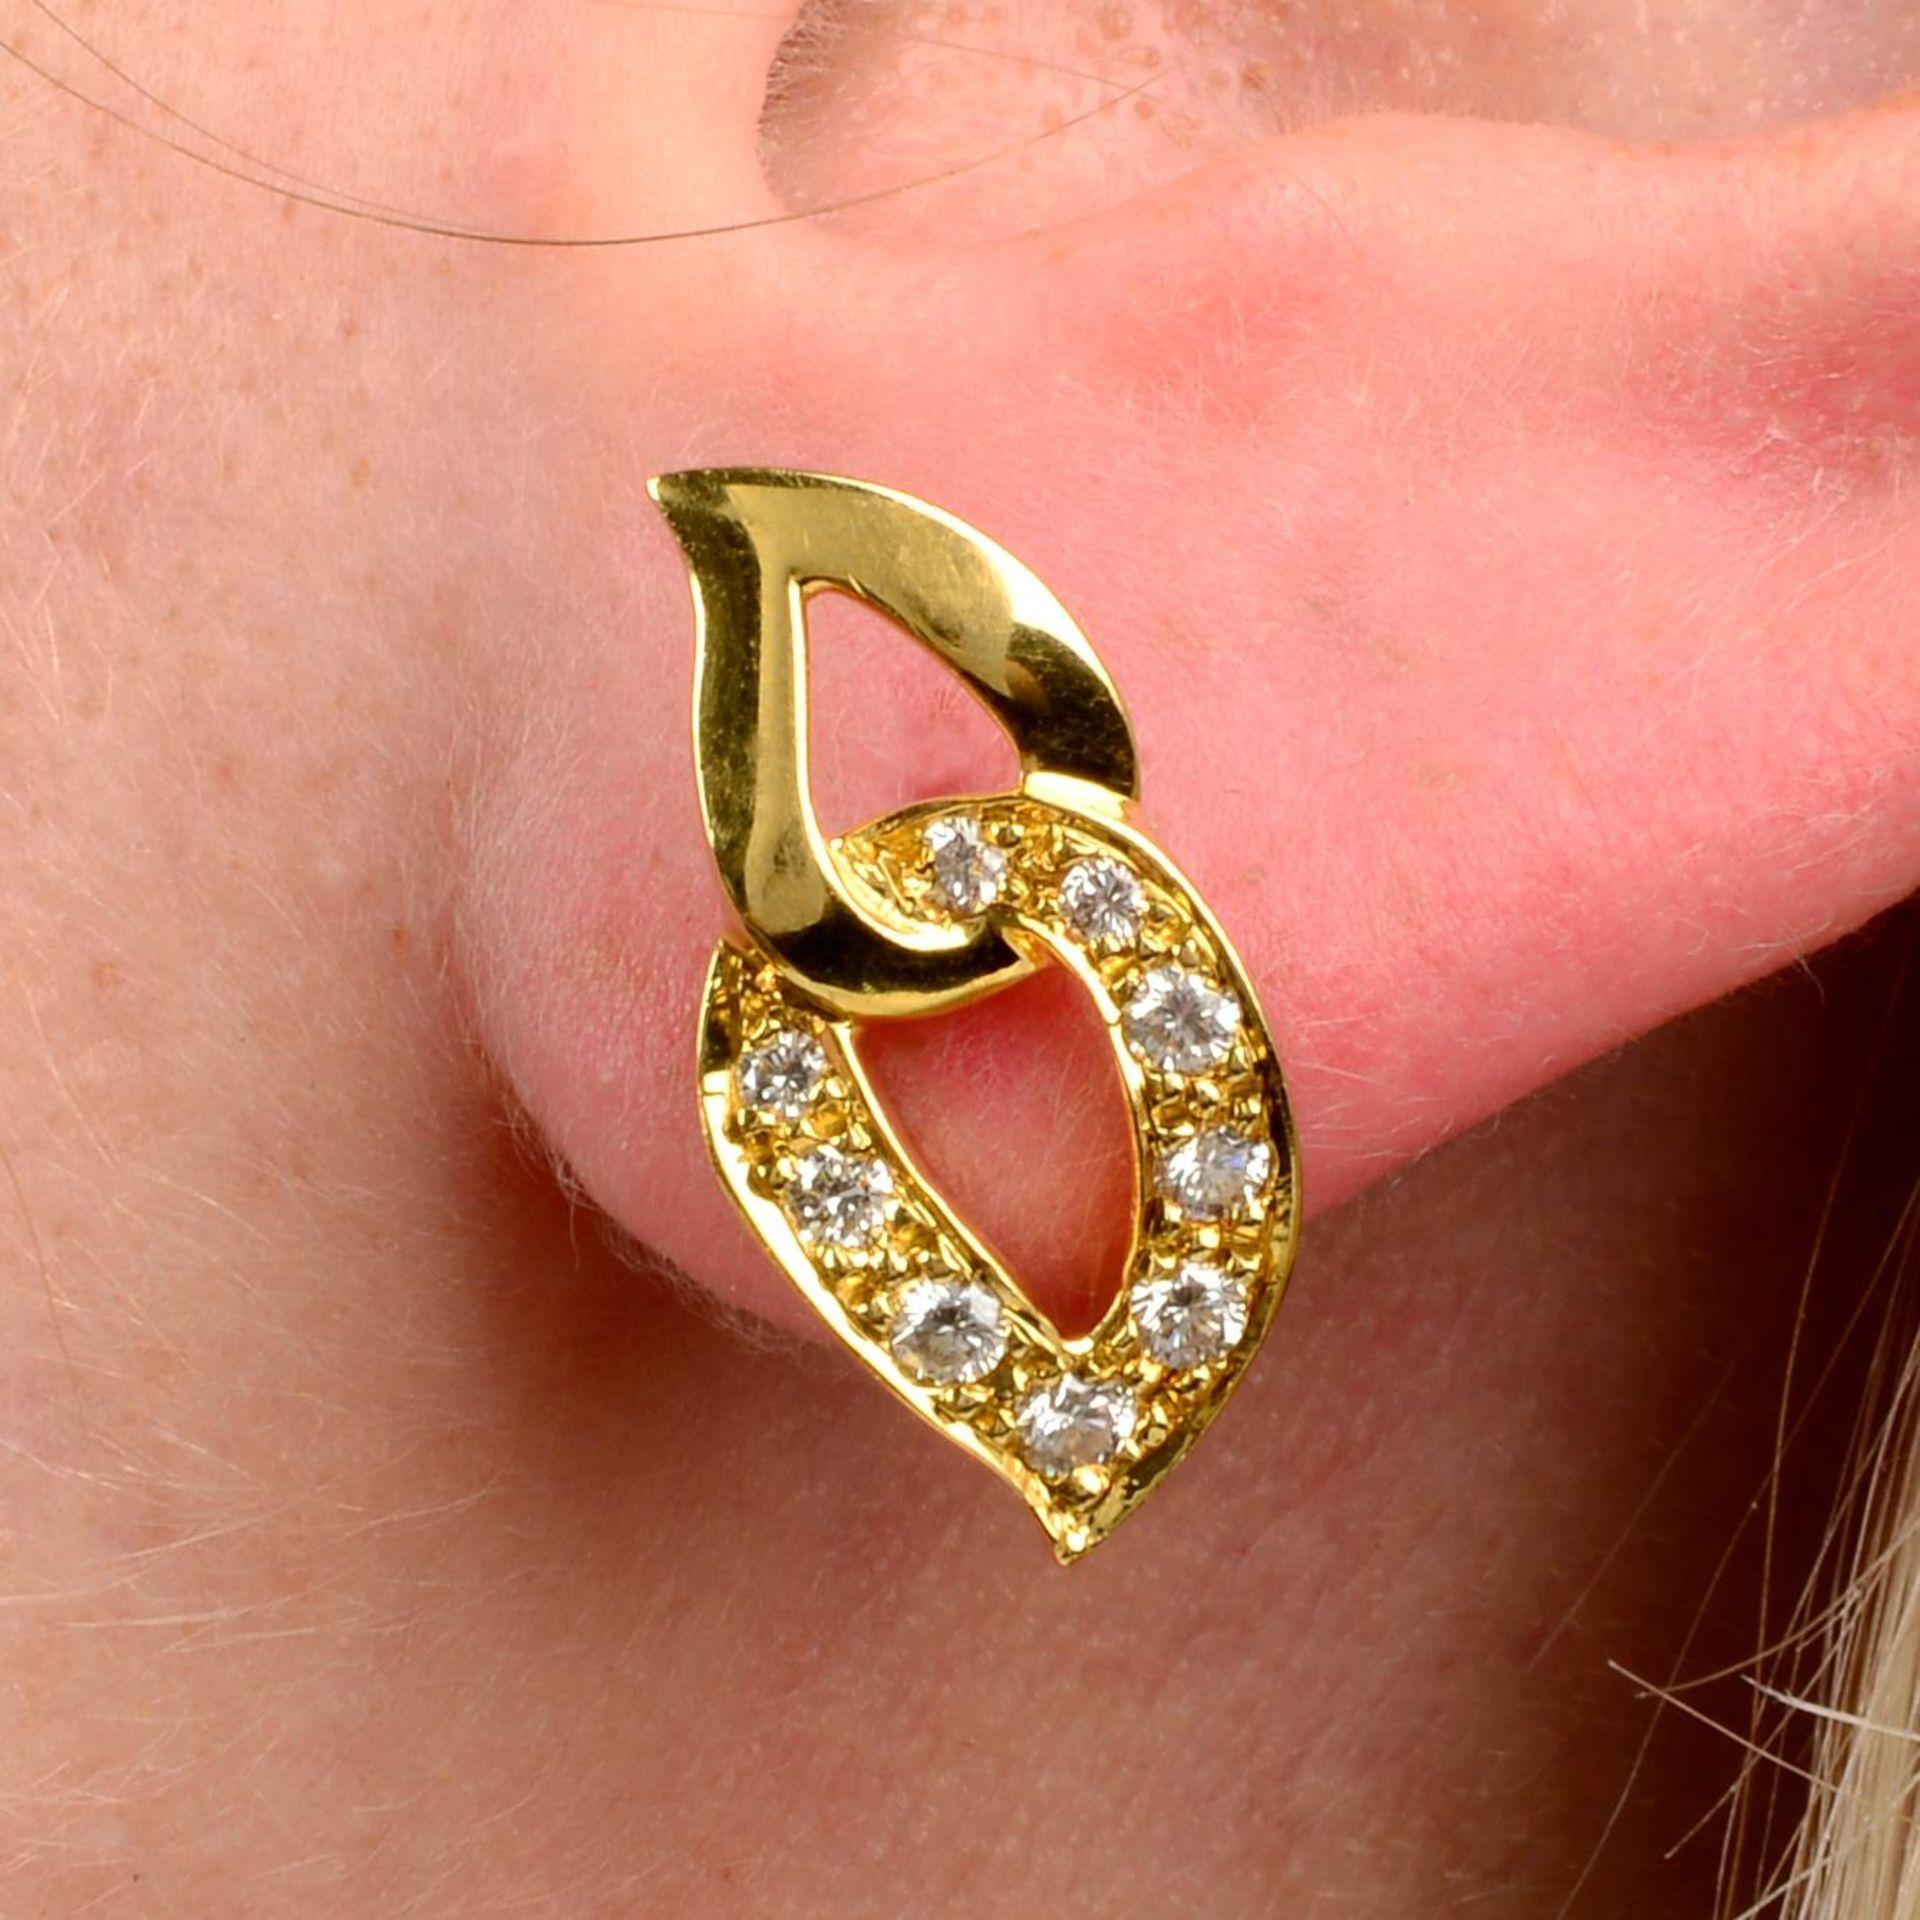 A pair of pavé-set diamond earrings, by Piaget.